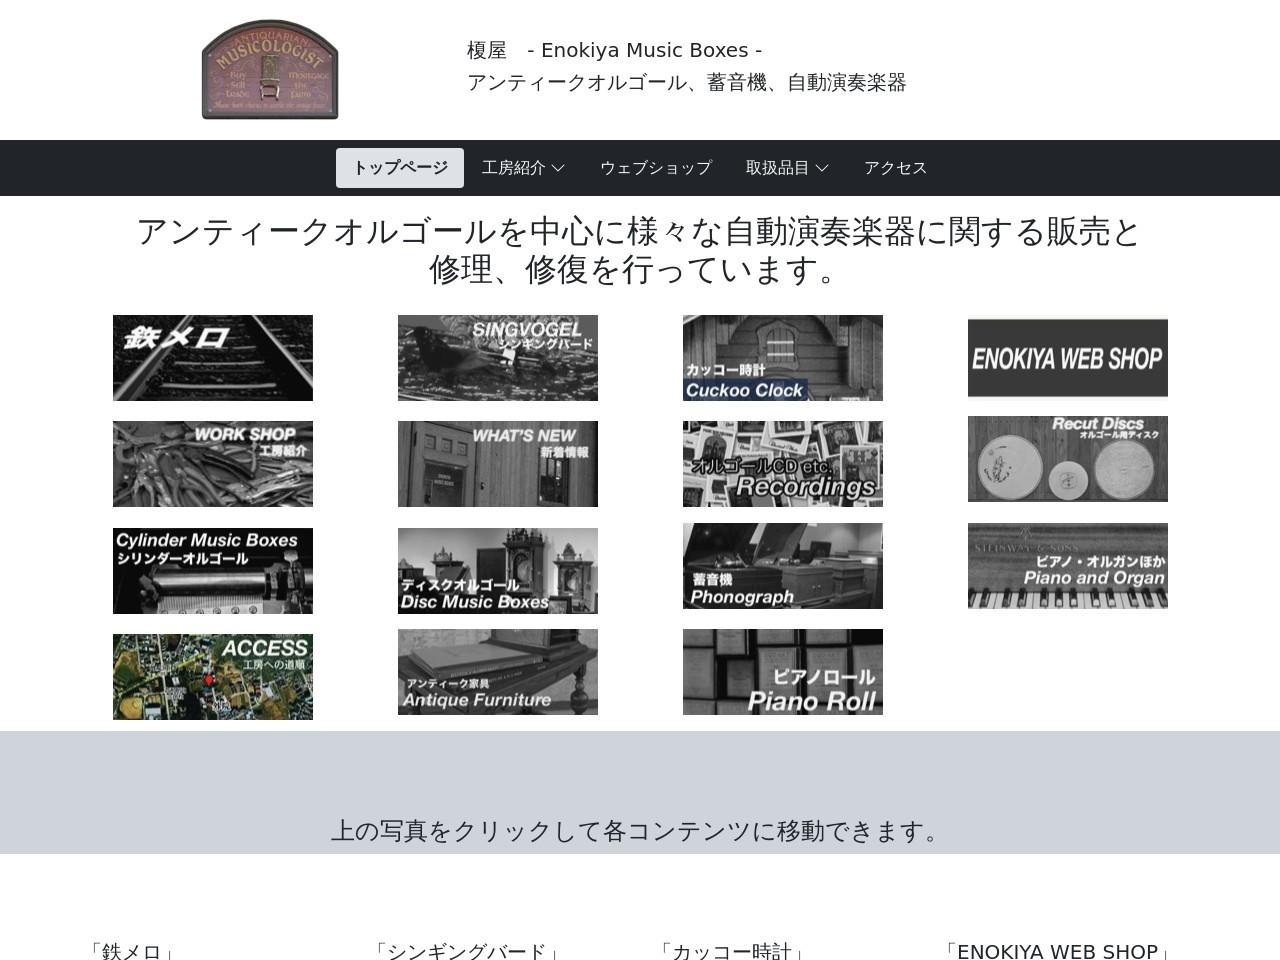 Enokiya Music Boxes | 株式会社榎屋 自動演奏楽器、オルゴール、蓄音機